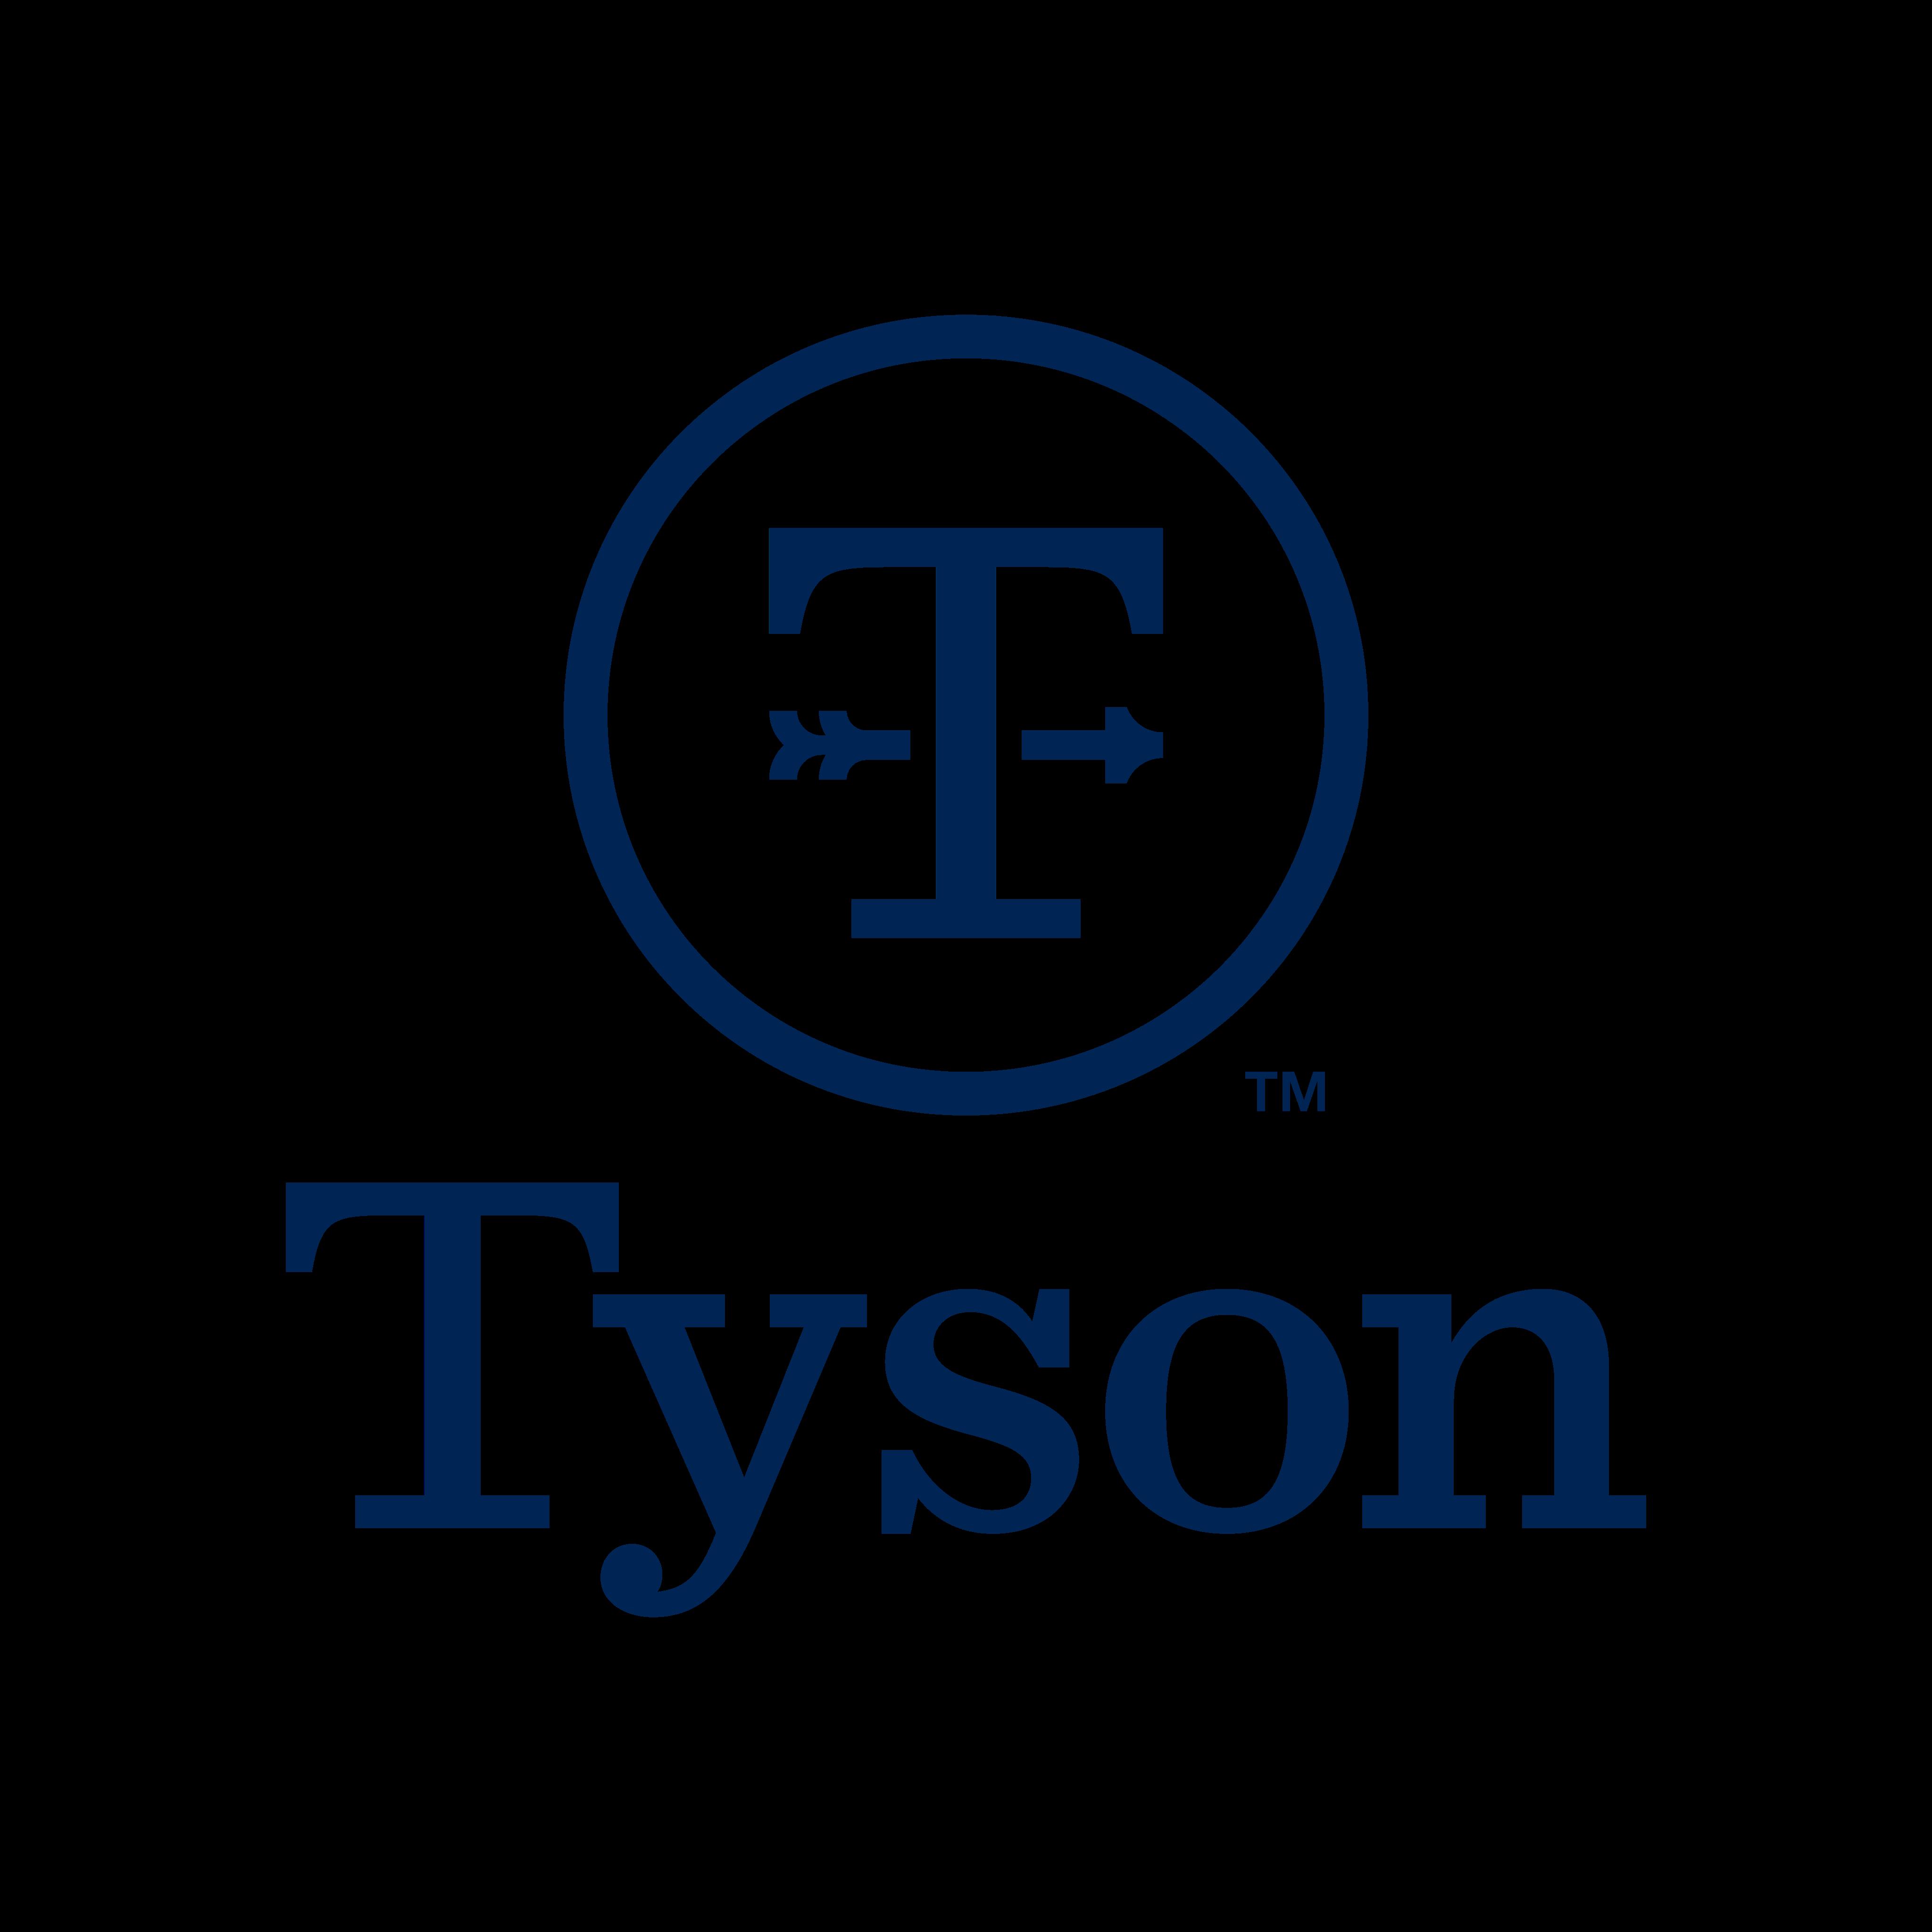 tyson foods logo 0 - Tyson Foods Logo